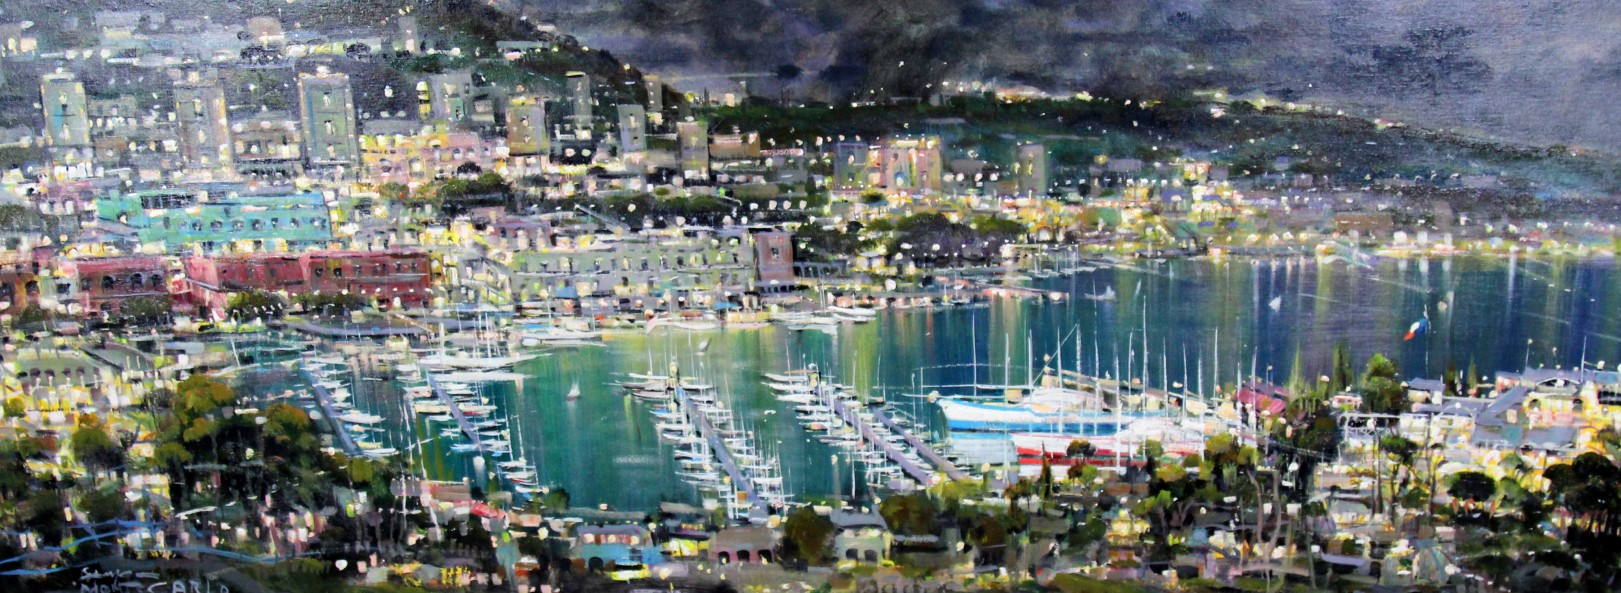 Mario Sanzone_Evening, Monte Carlo_Oils_23x60 (2)